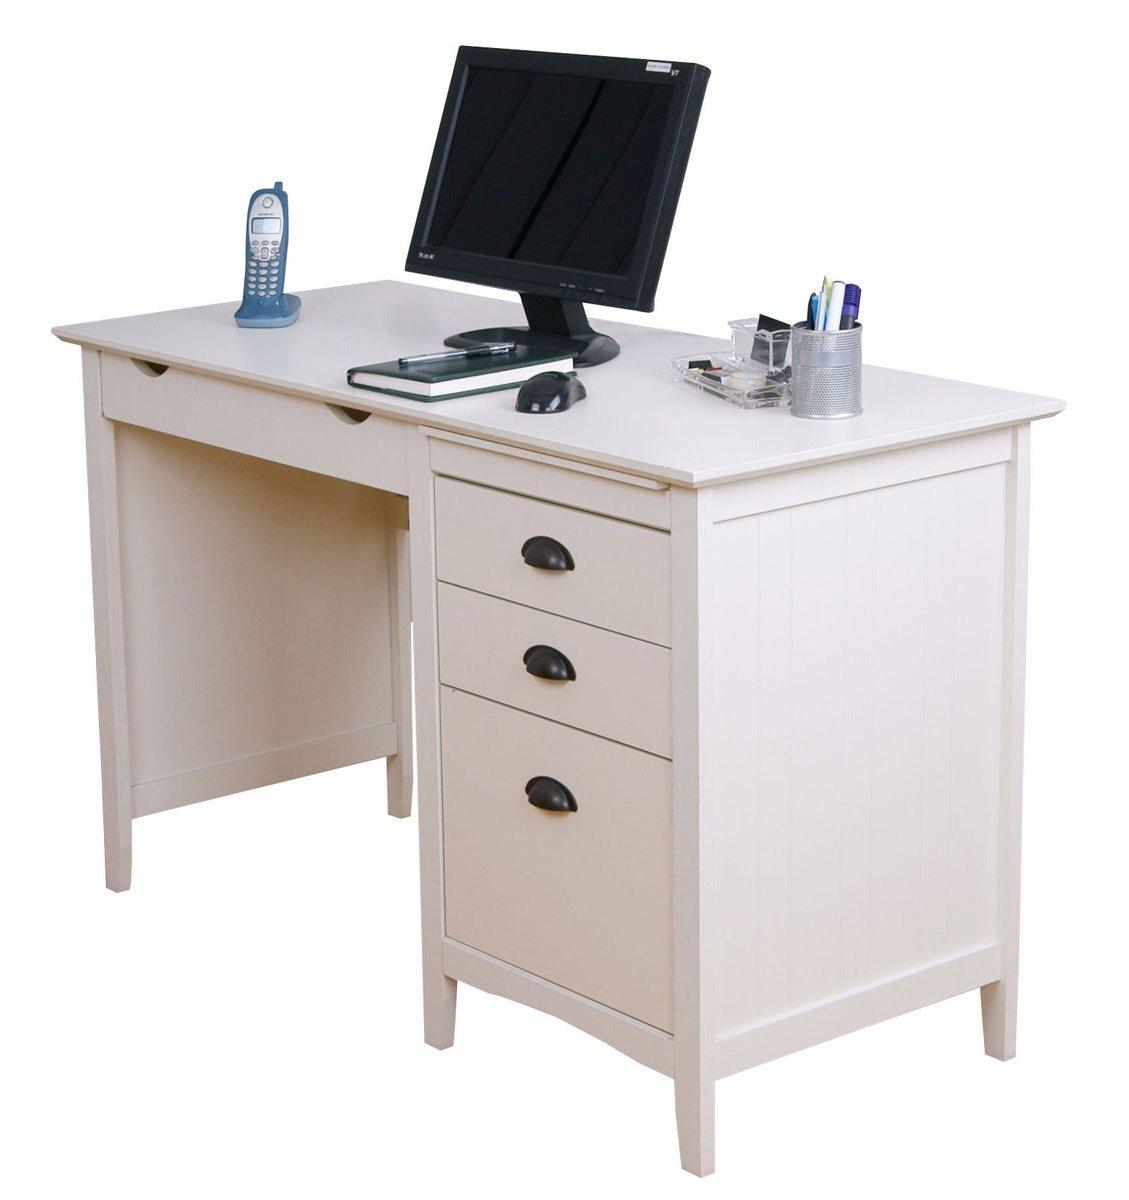 Teknik 2516311 Computer Desks